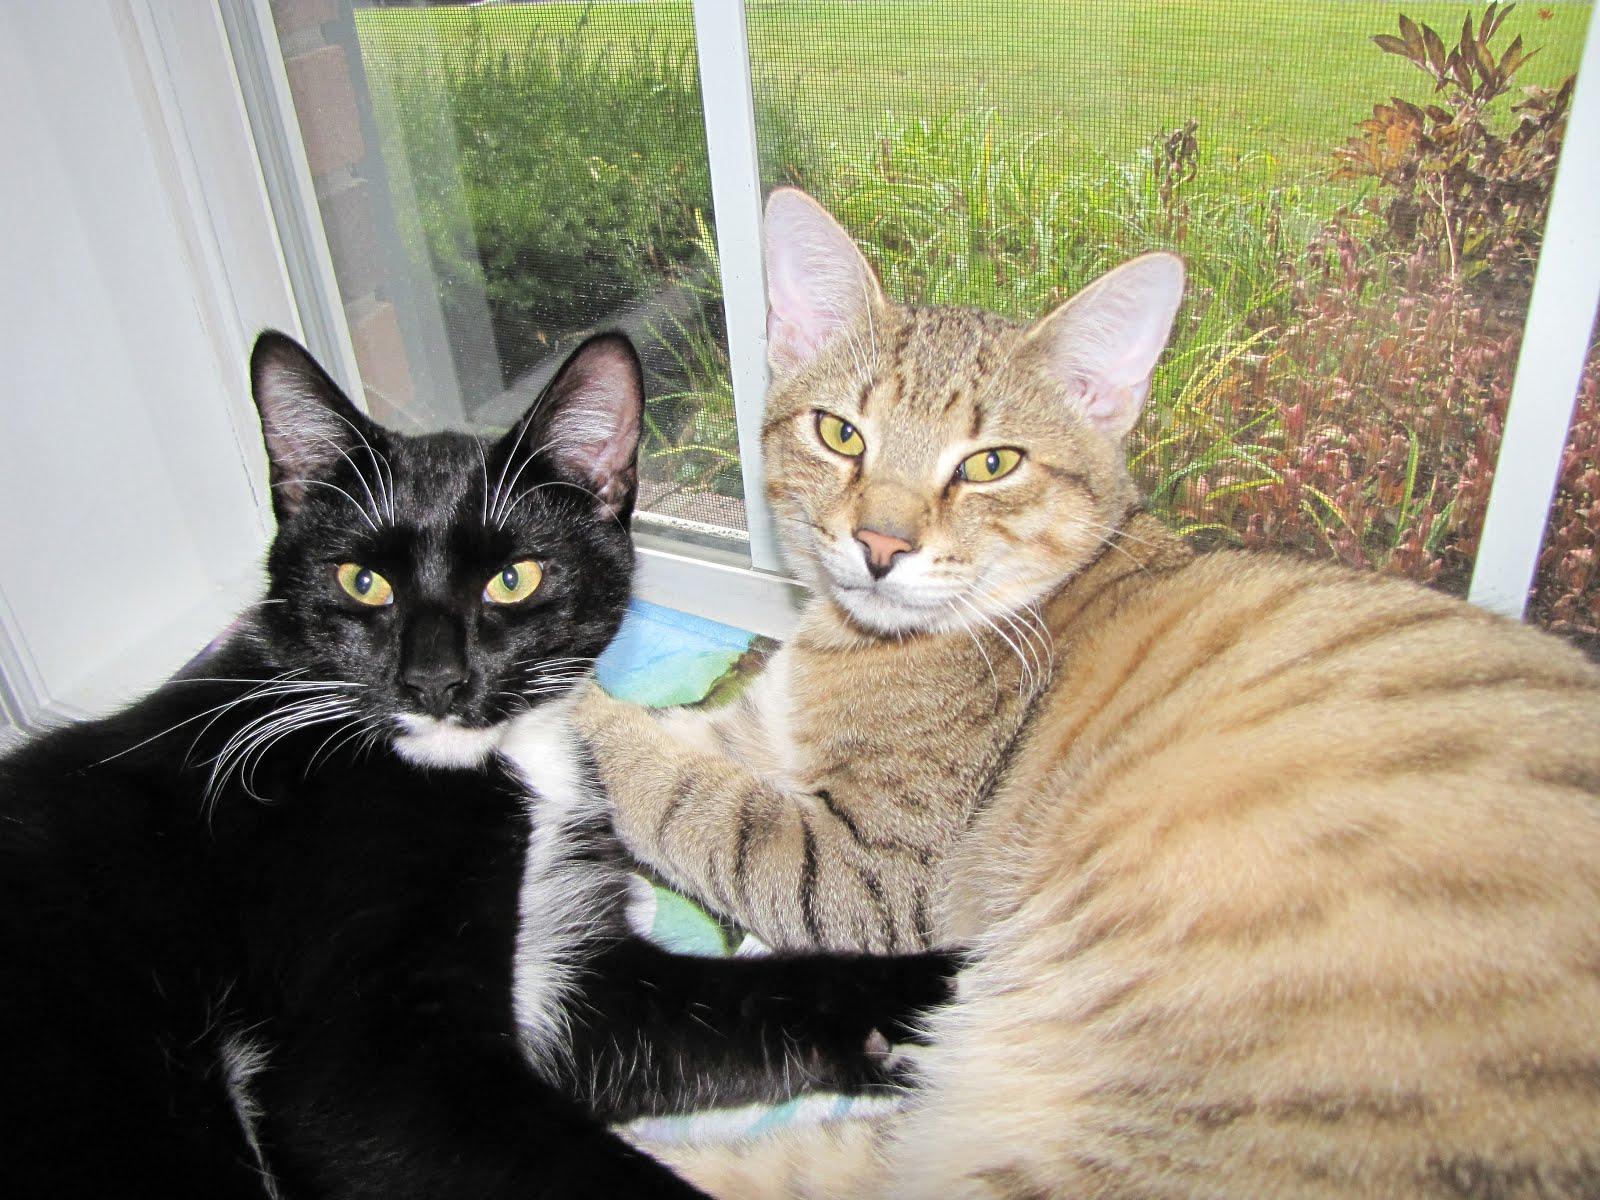 Dorian and Jasper (my fur babies)